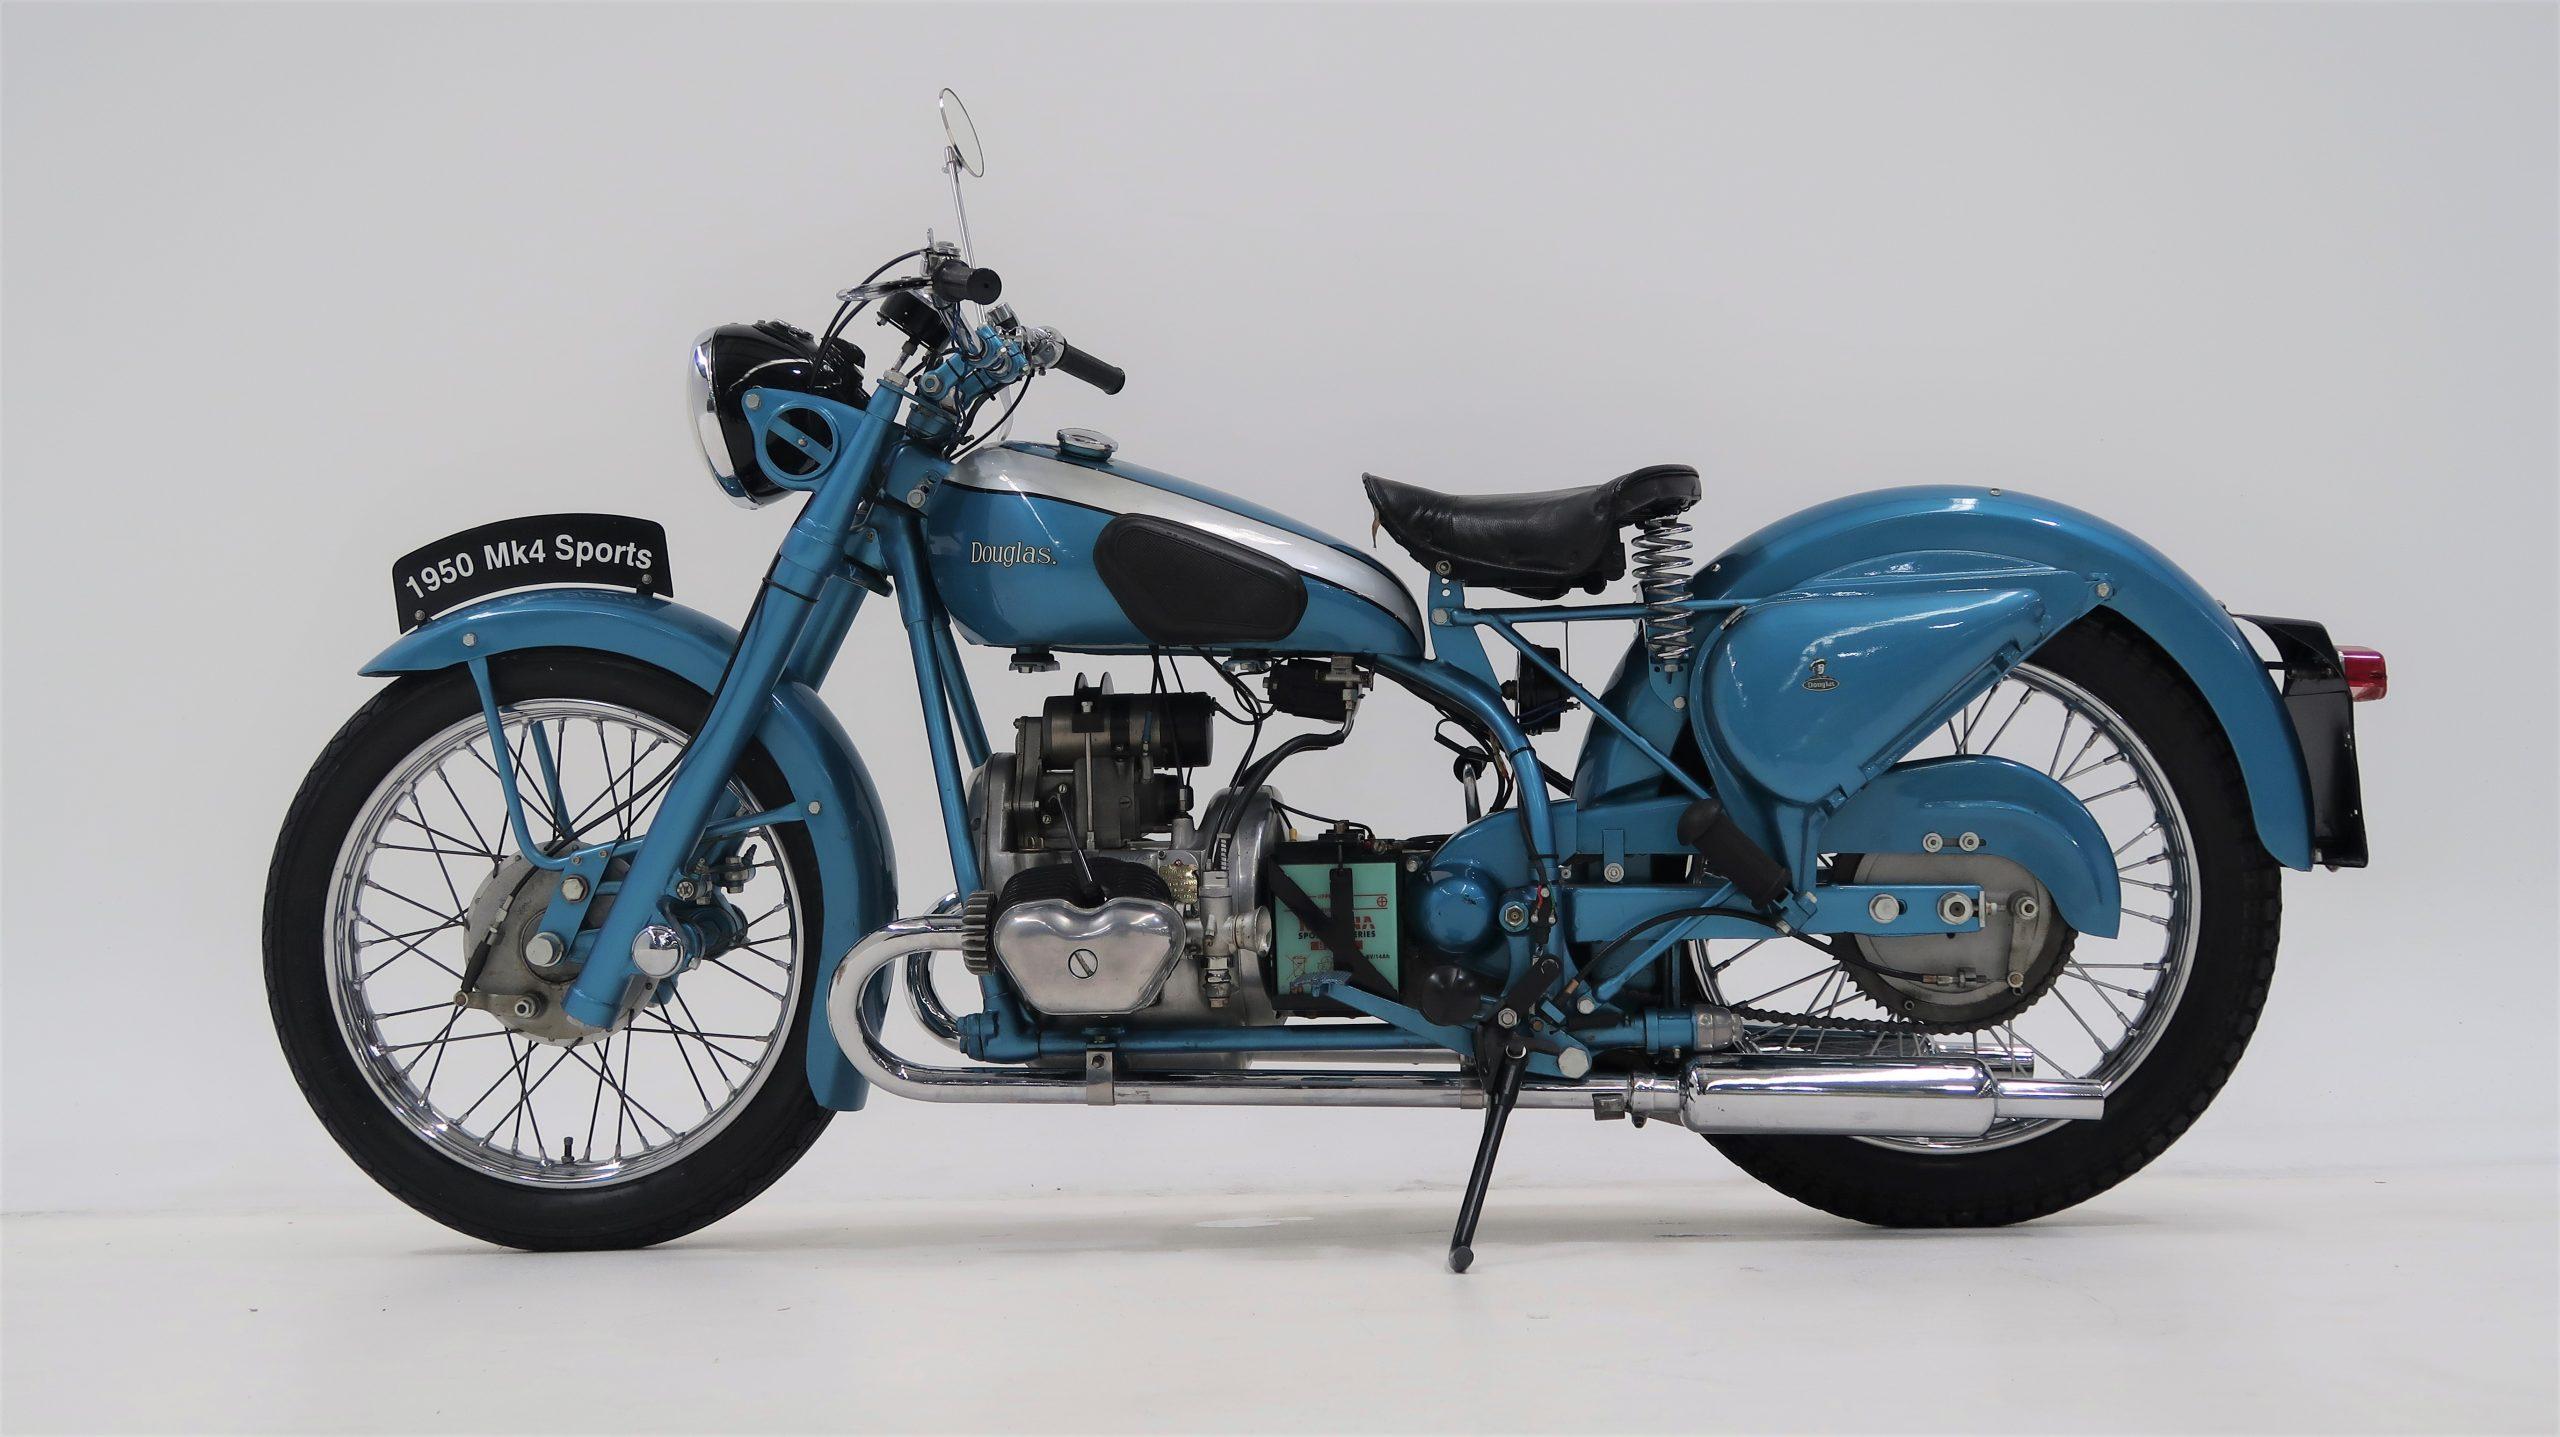 1950 British Douglas Mark 4 350cc